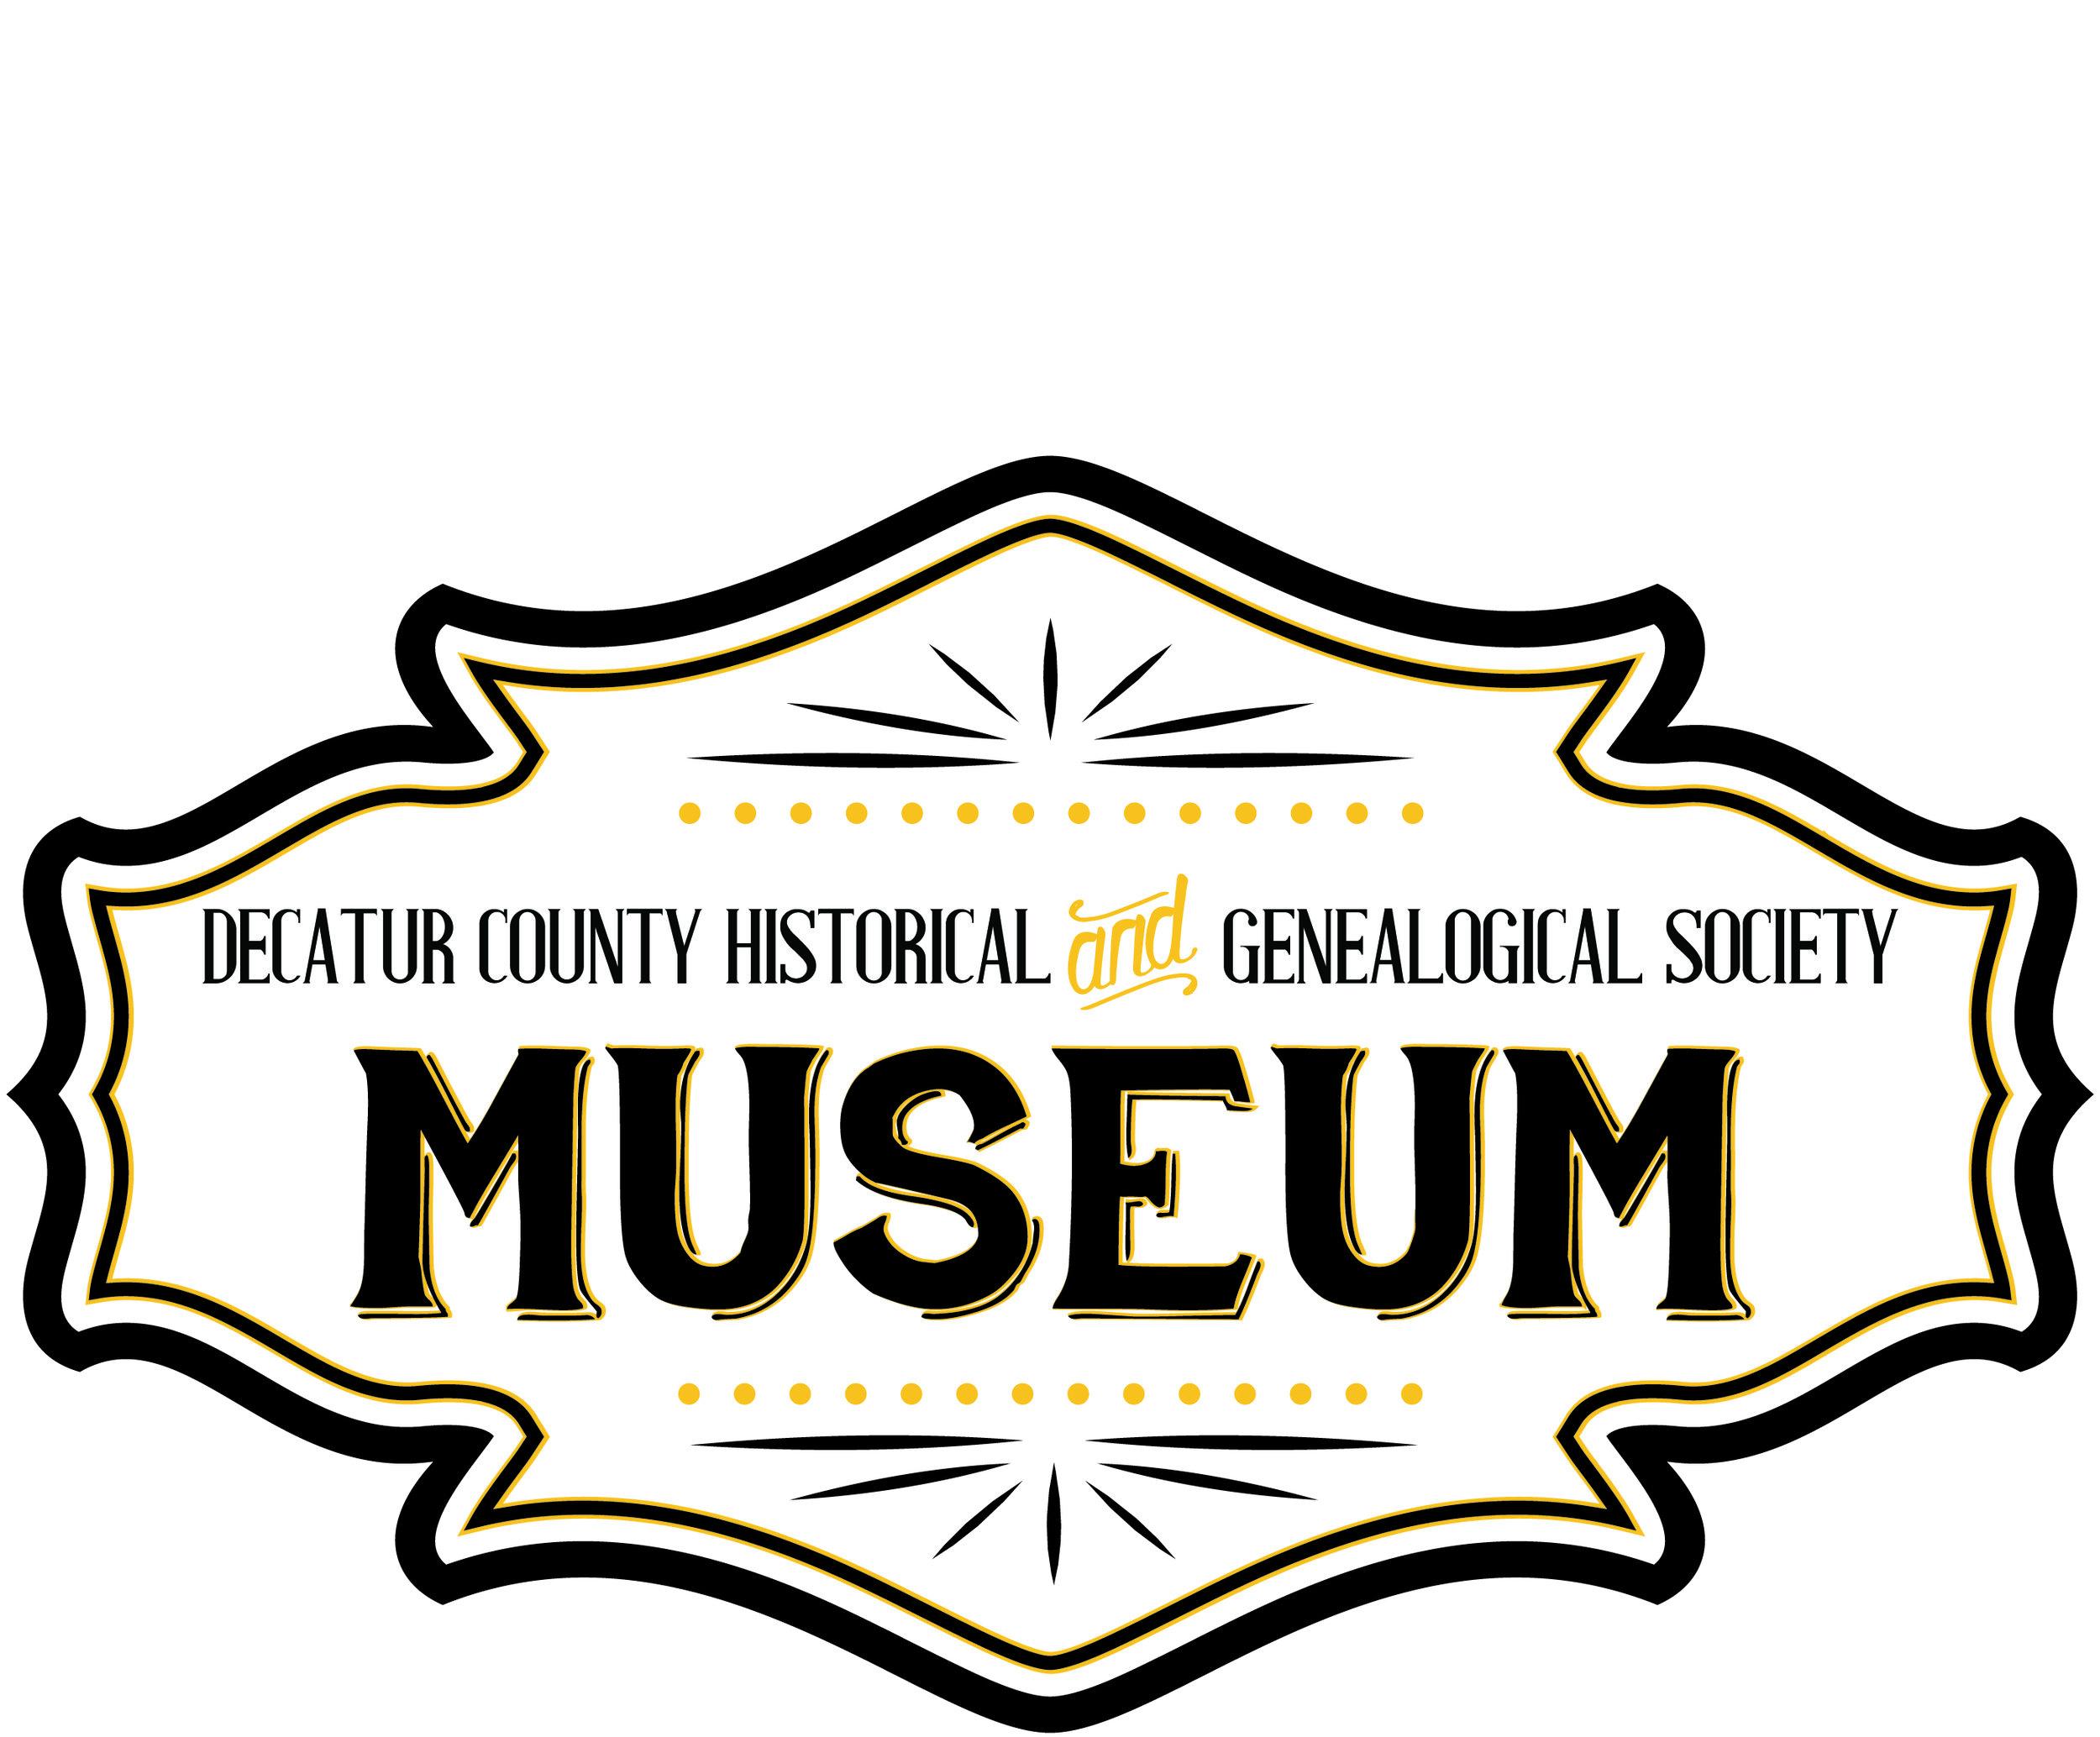 Dec Co Museum Logo.jpg